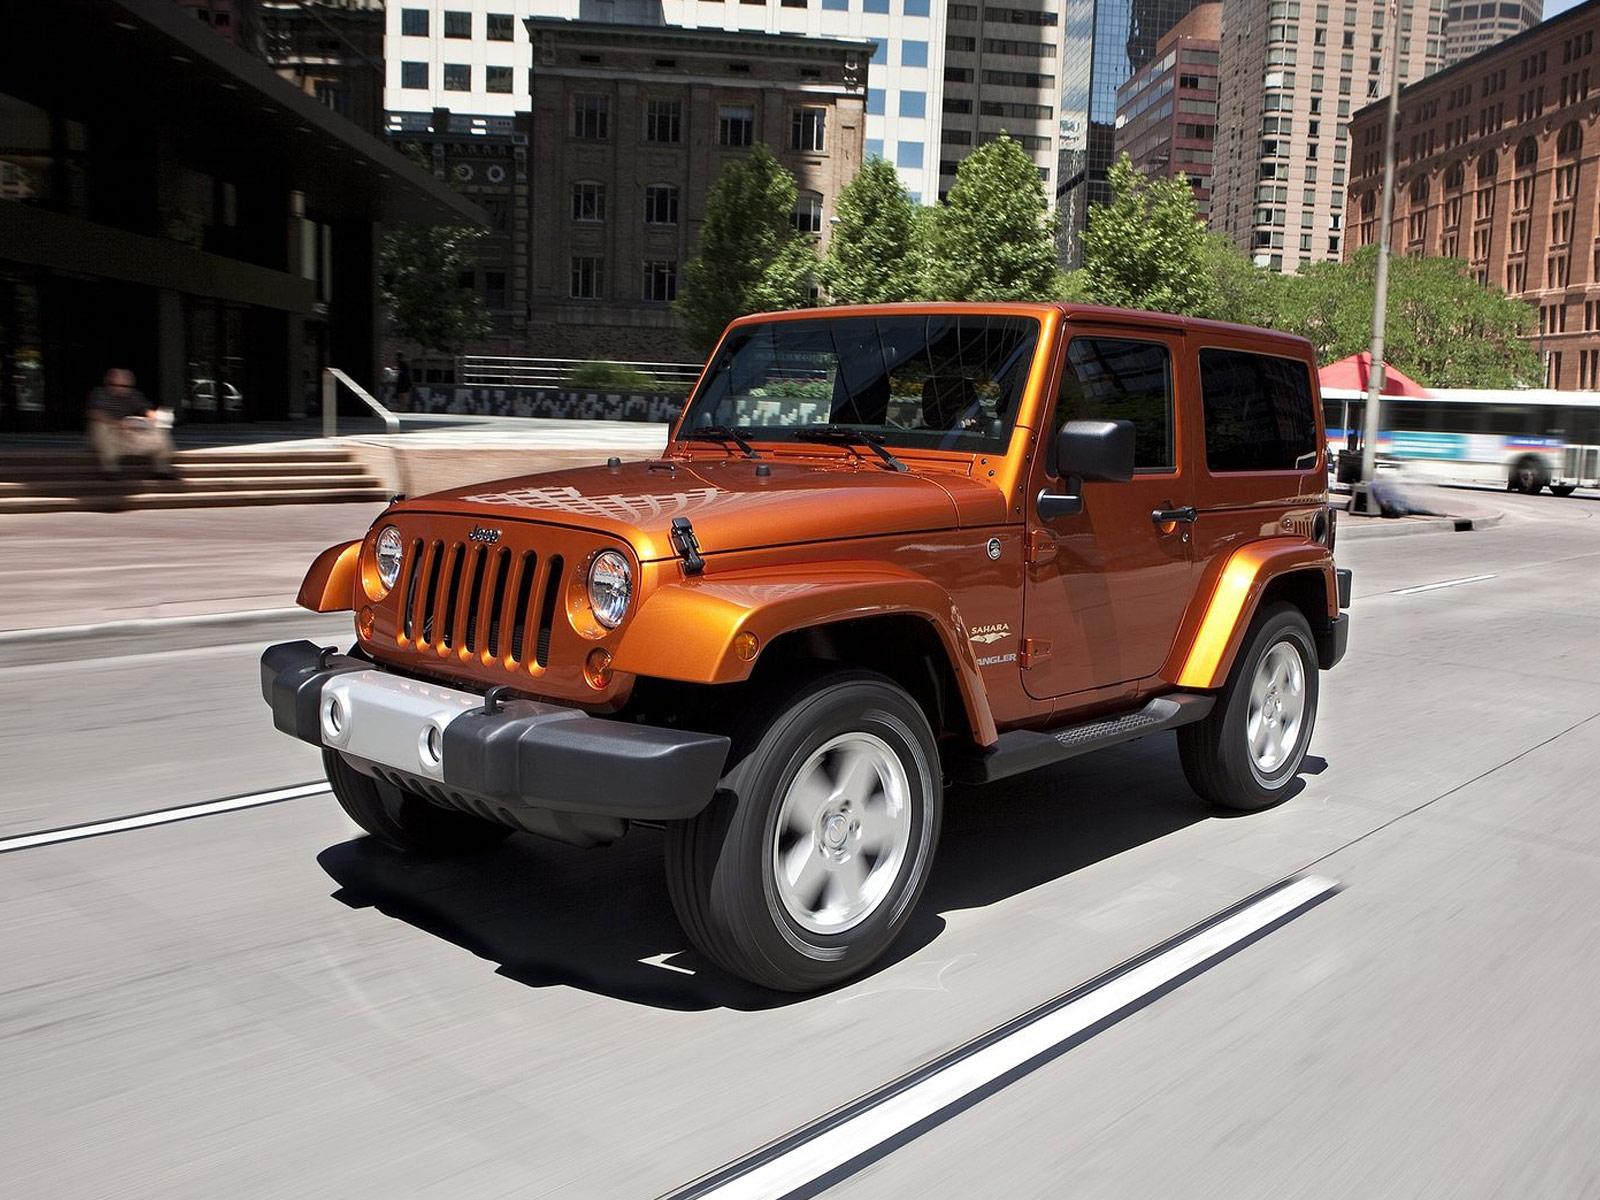 http://2.bp.blogspot.com/_m_XWwB73yT4/THhqpFXXqUI/AAAAAAAACDA/qEGrmVdG3IA/s1600/Jeep_Wrangler_2011_car_pictures-07.jpg